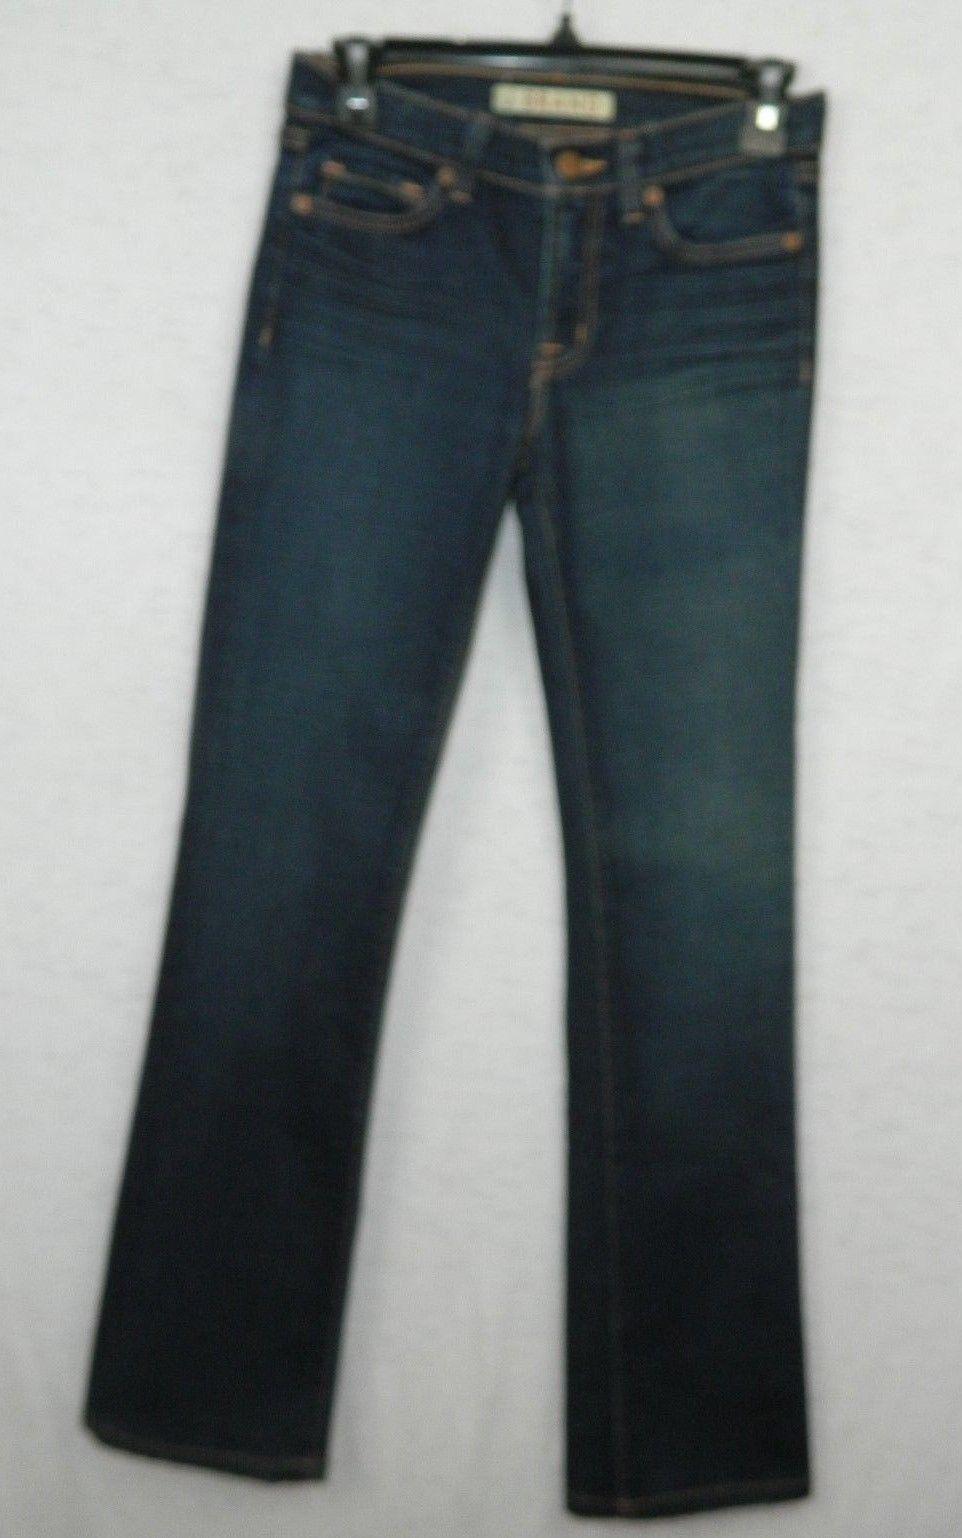 J Brand Jeans Straight Leg Jeans  Dark Wash Style #805 Size 25 image 7